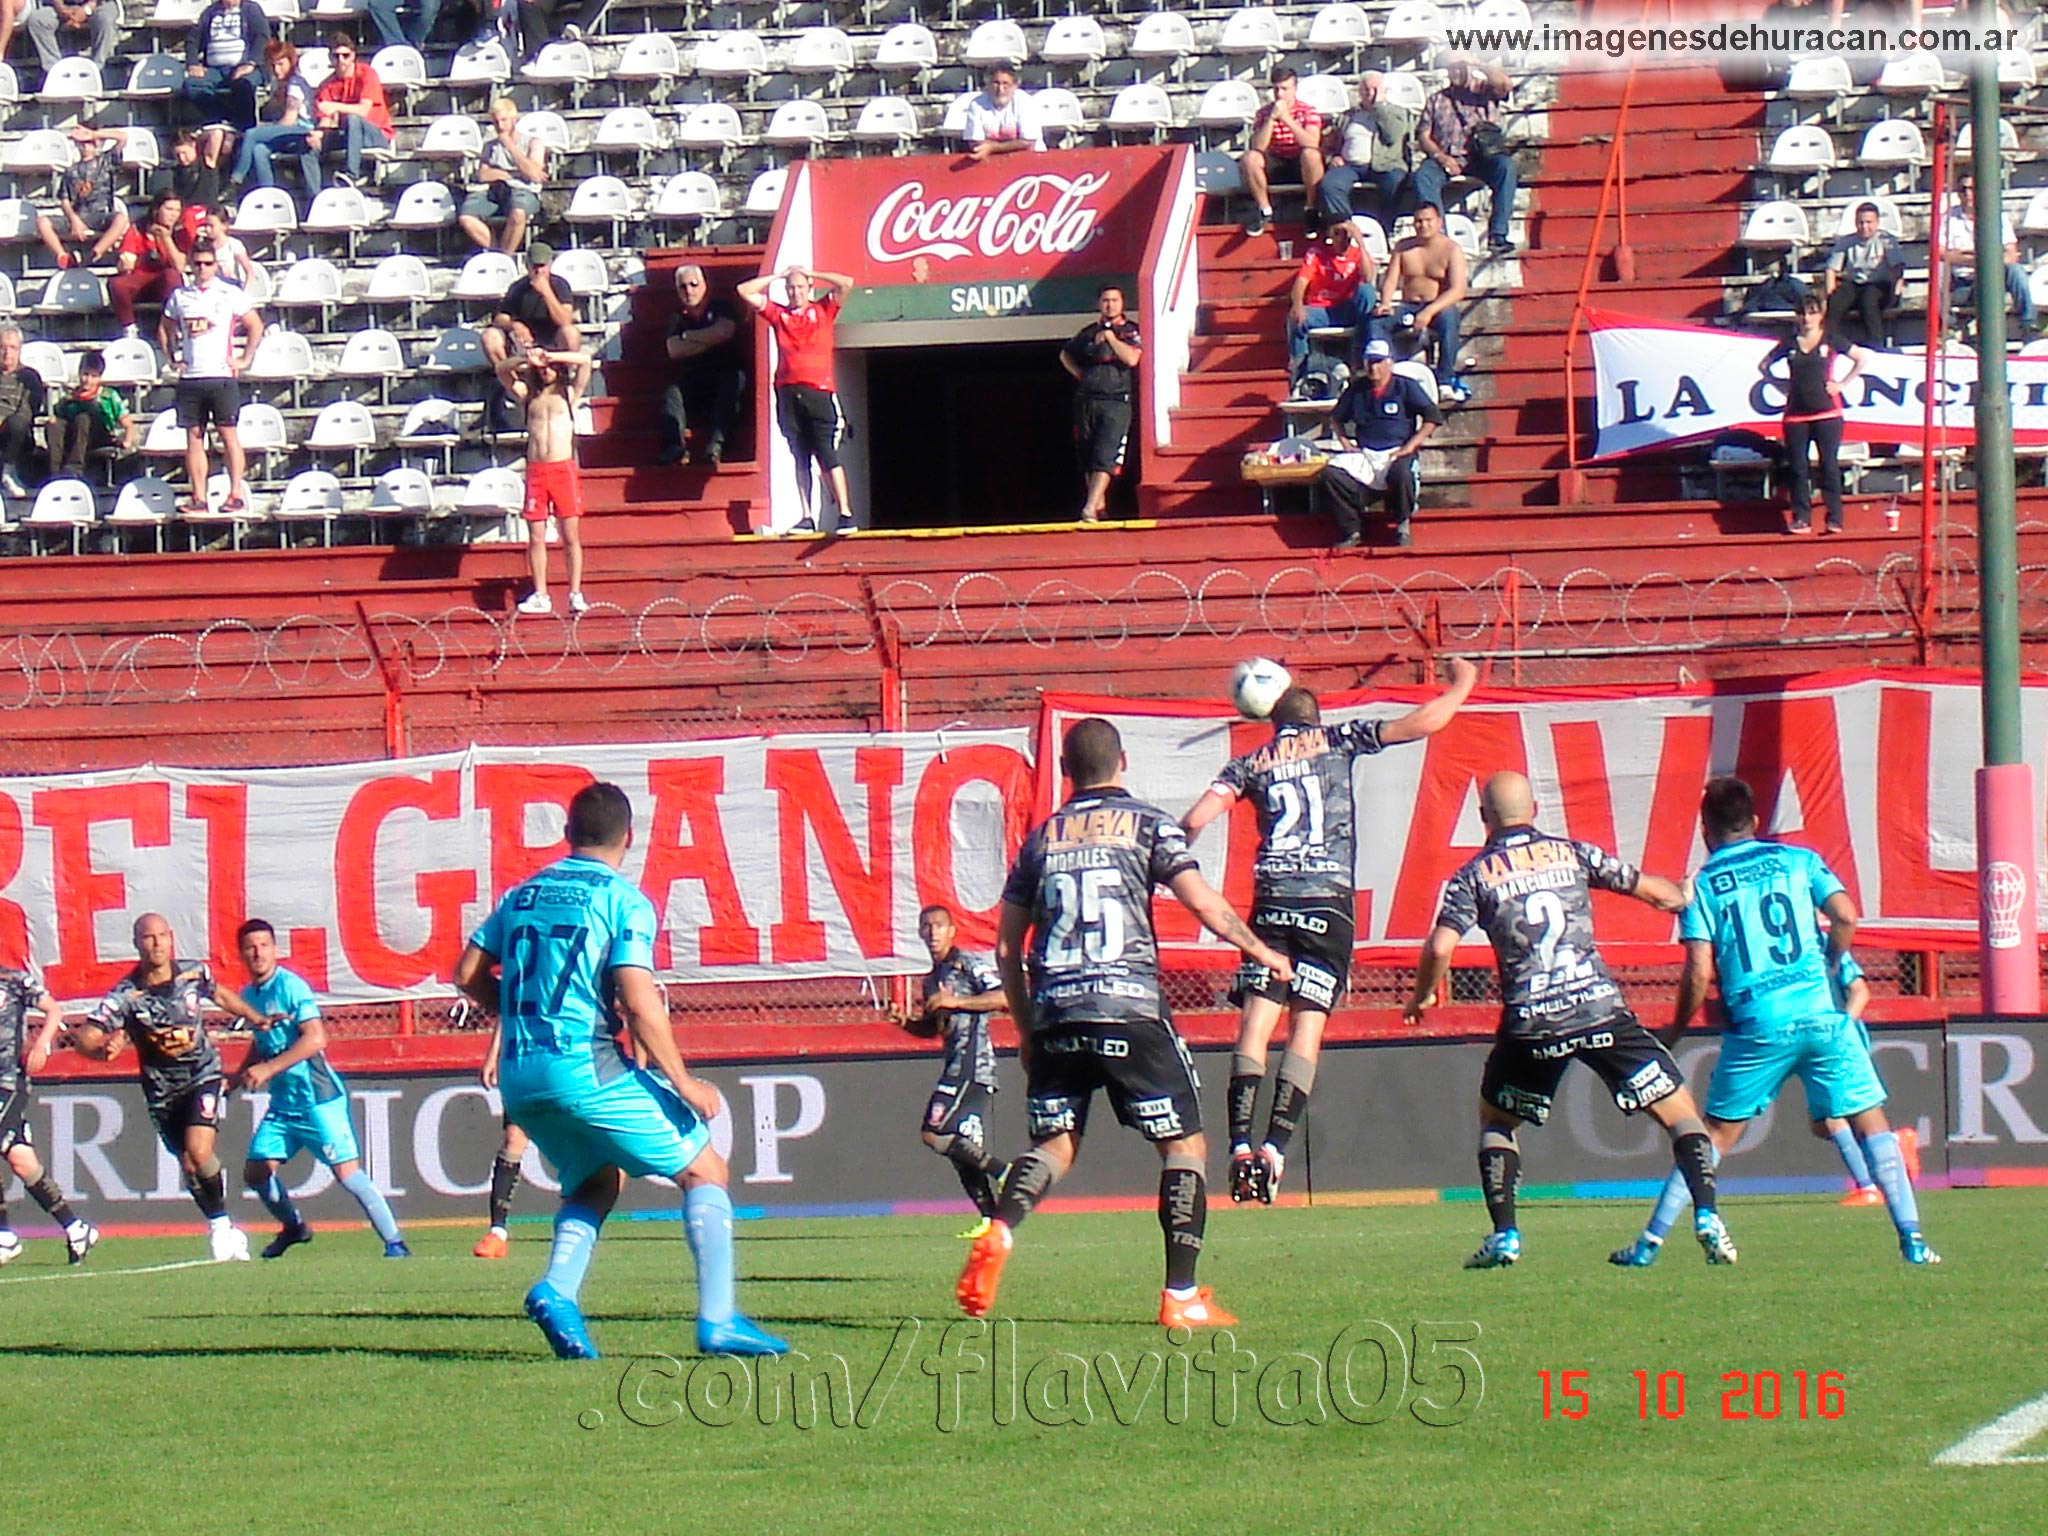 Huracán vs temperley fecha 06 primera división 2016-2017